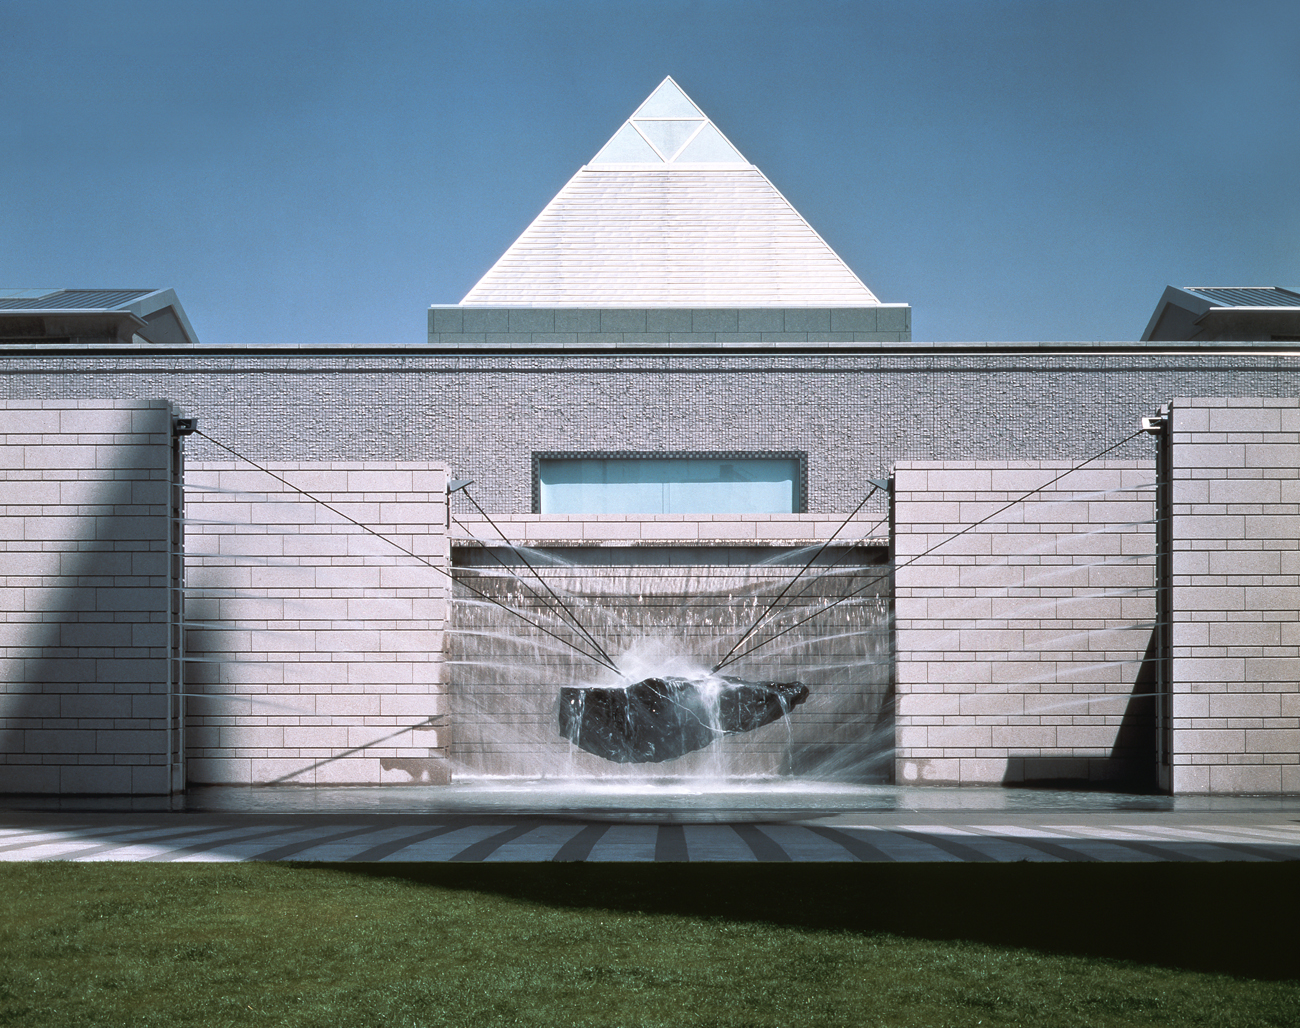 06-the-exterior-of-gallery-art-tower-mito-1990-yasuhiro-ishimoto